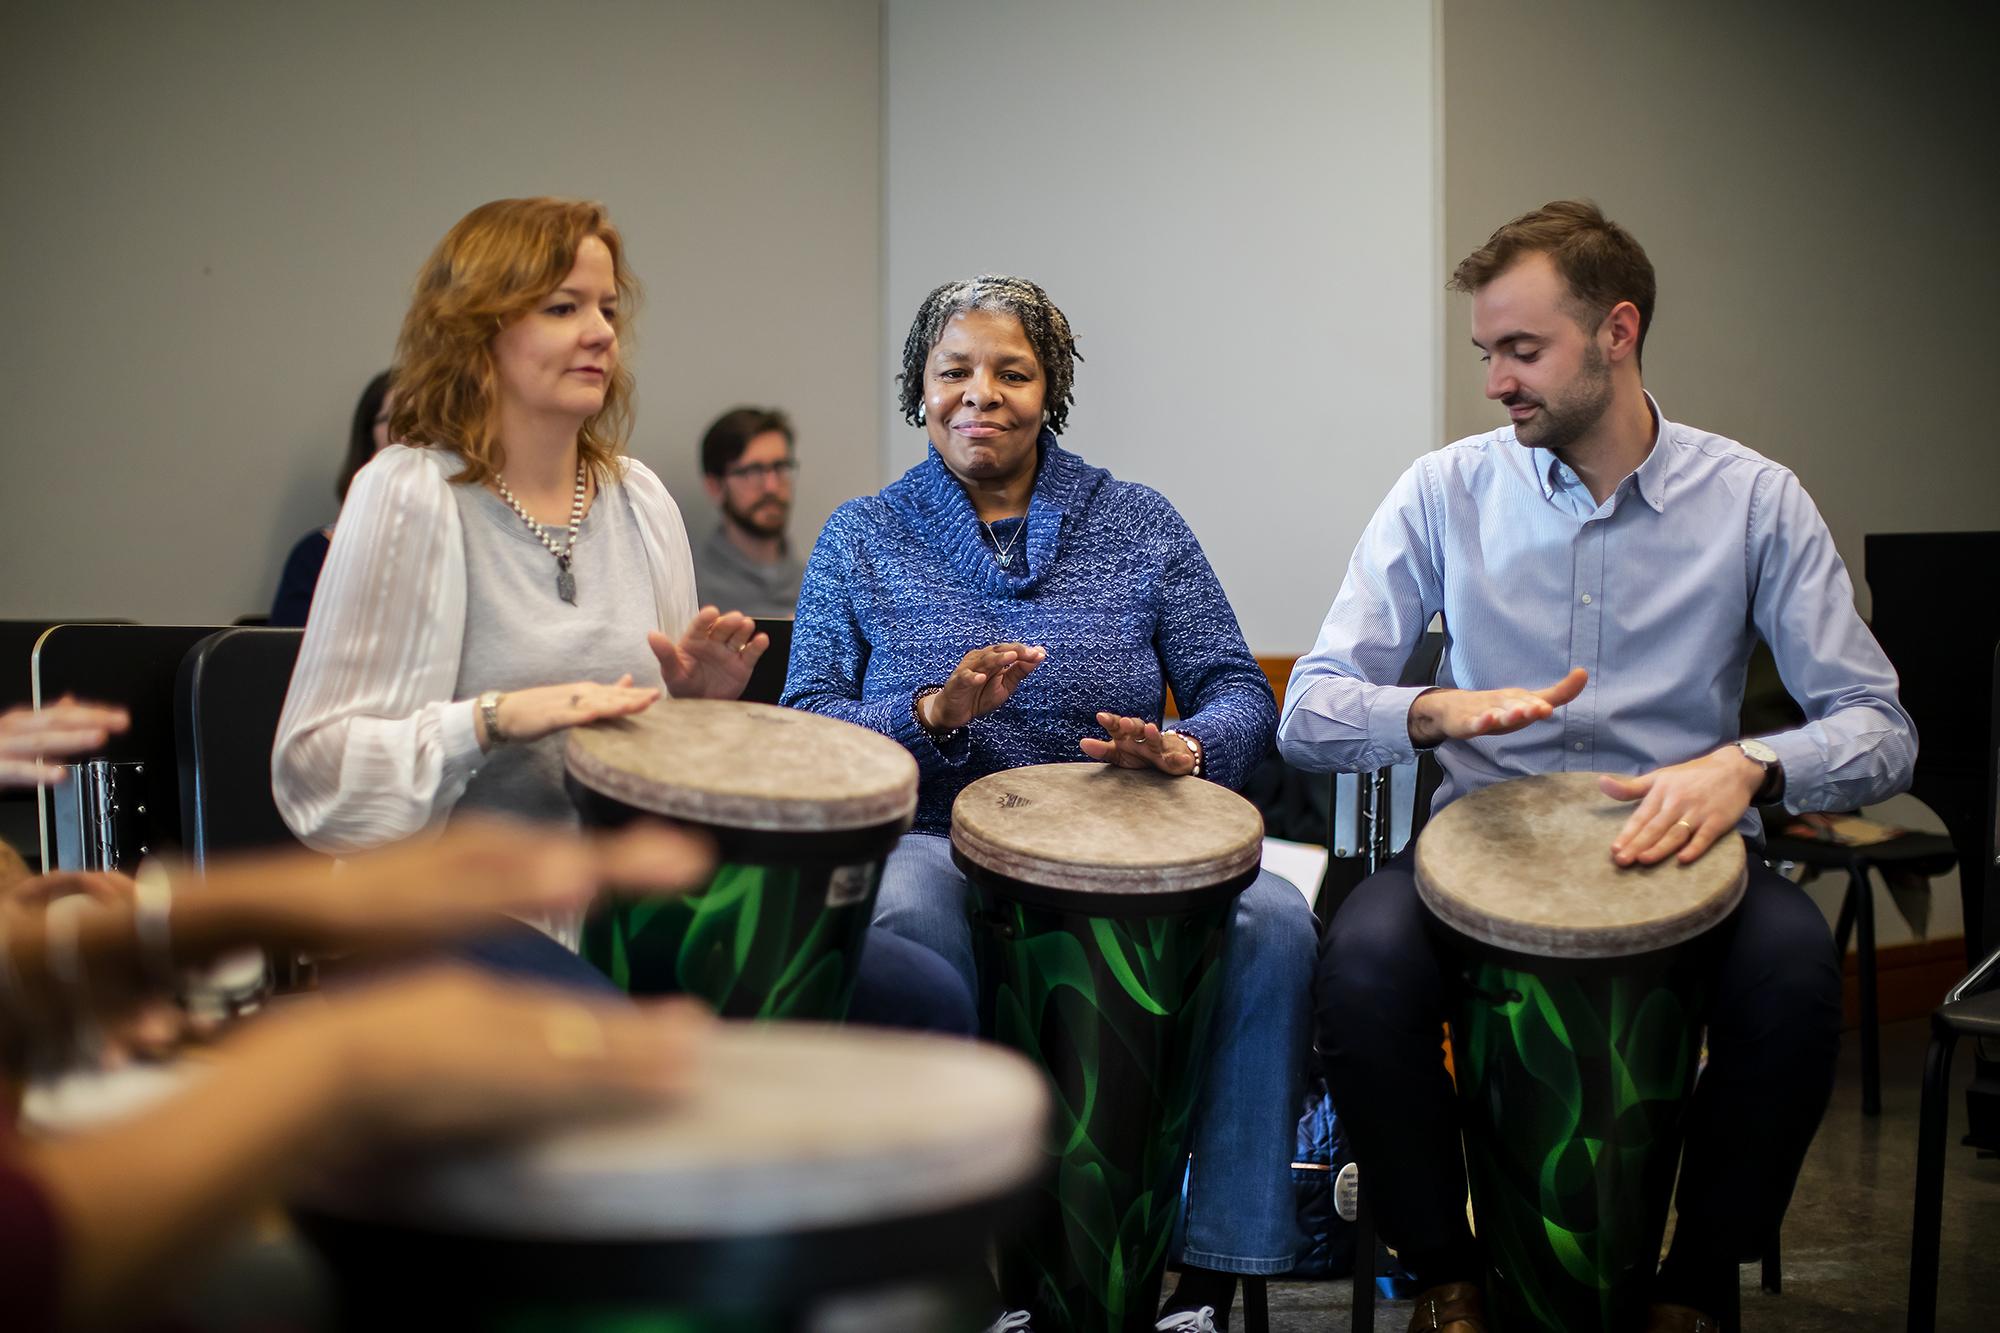 A Creative Expression Through Music drum circle. Photo by Eric Sucar/Penn University Communications.